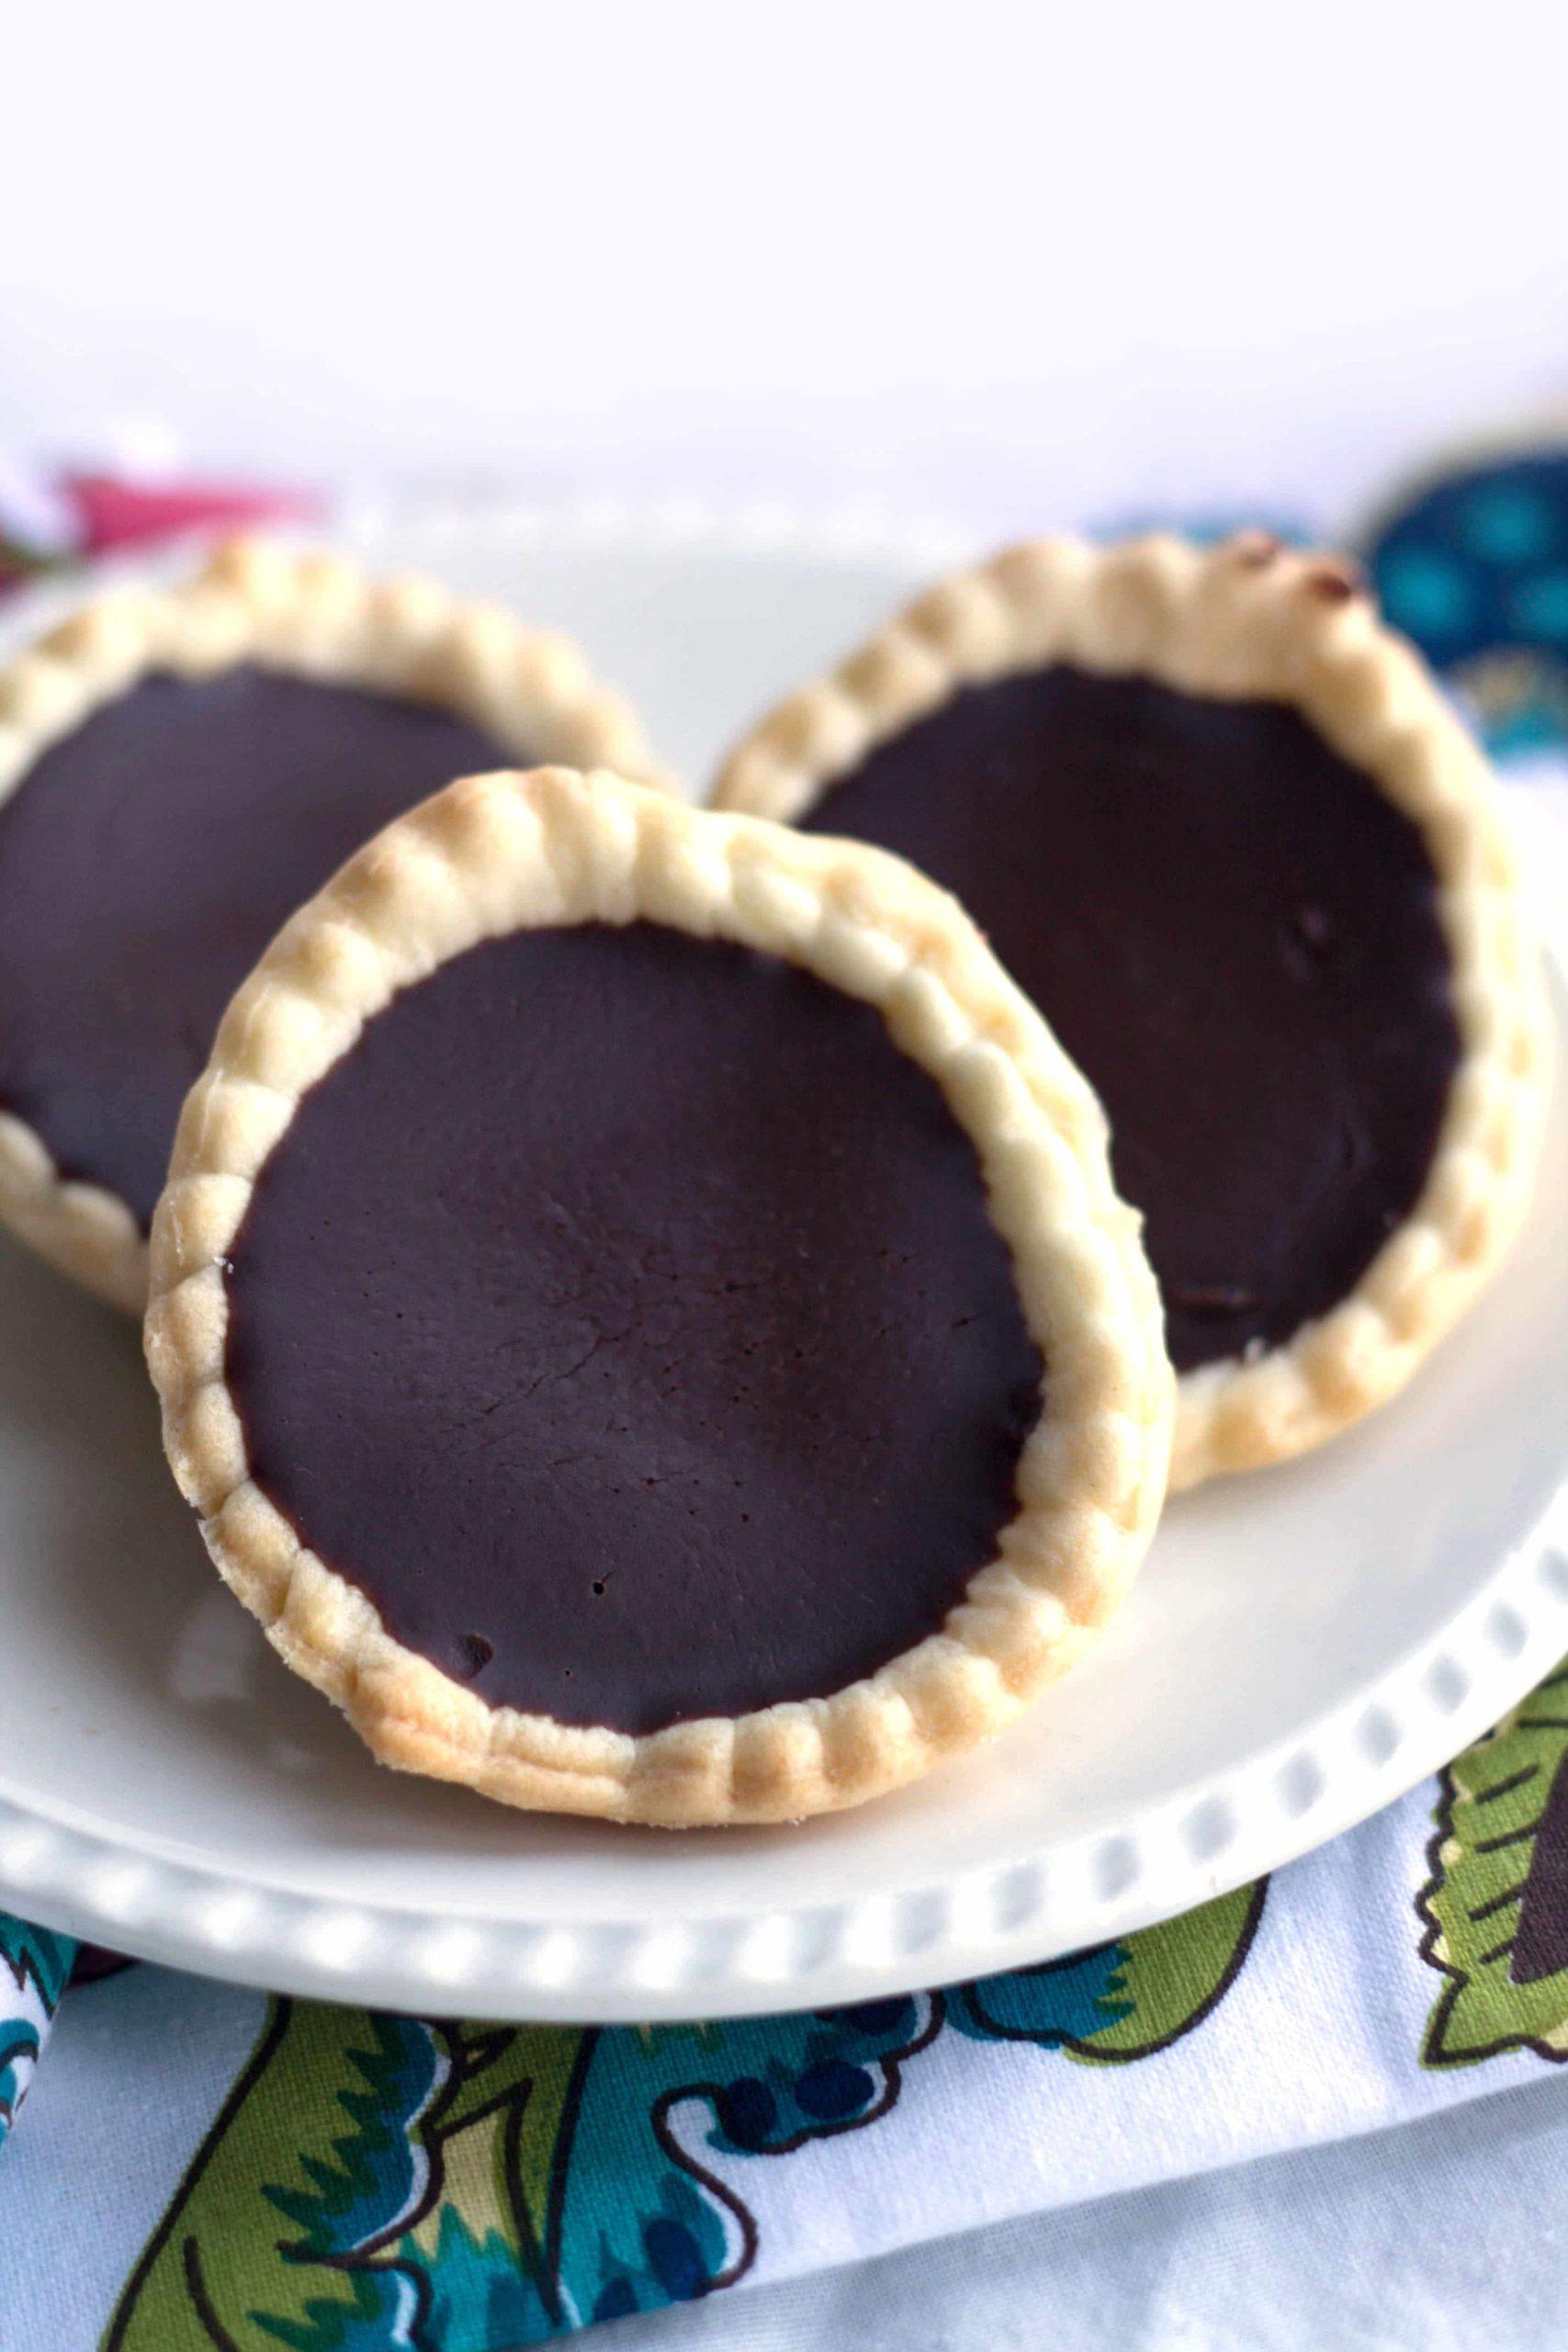 three plain chocolate ganache tarts on a white plate